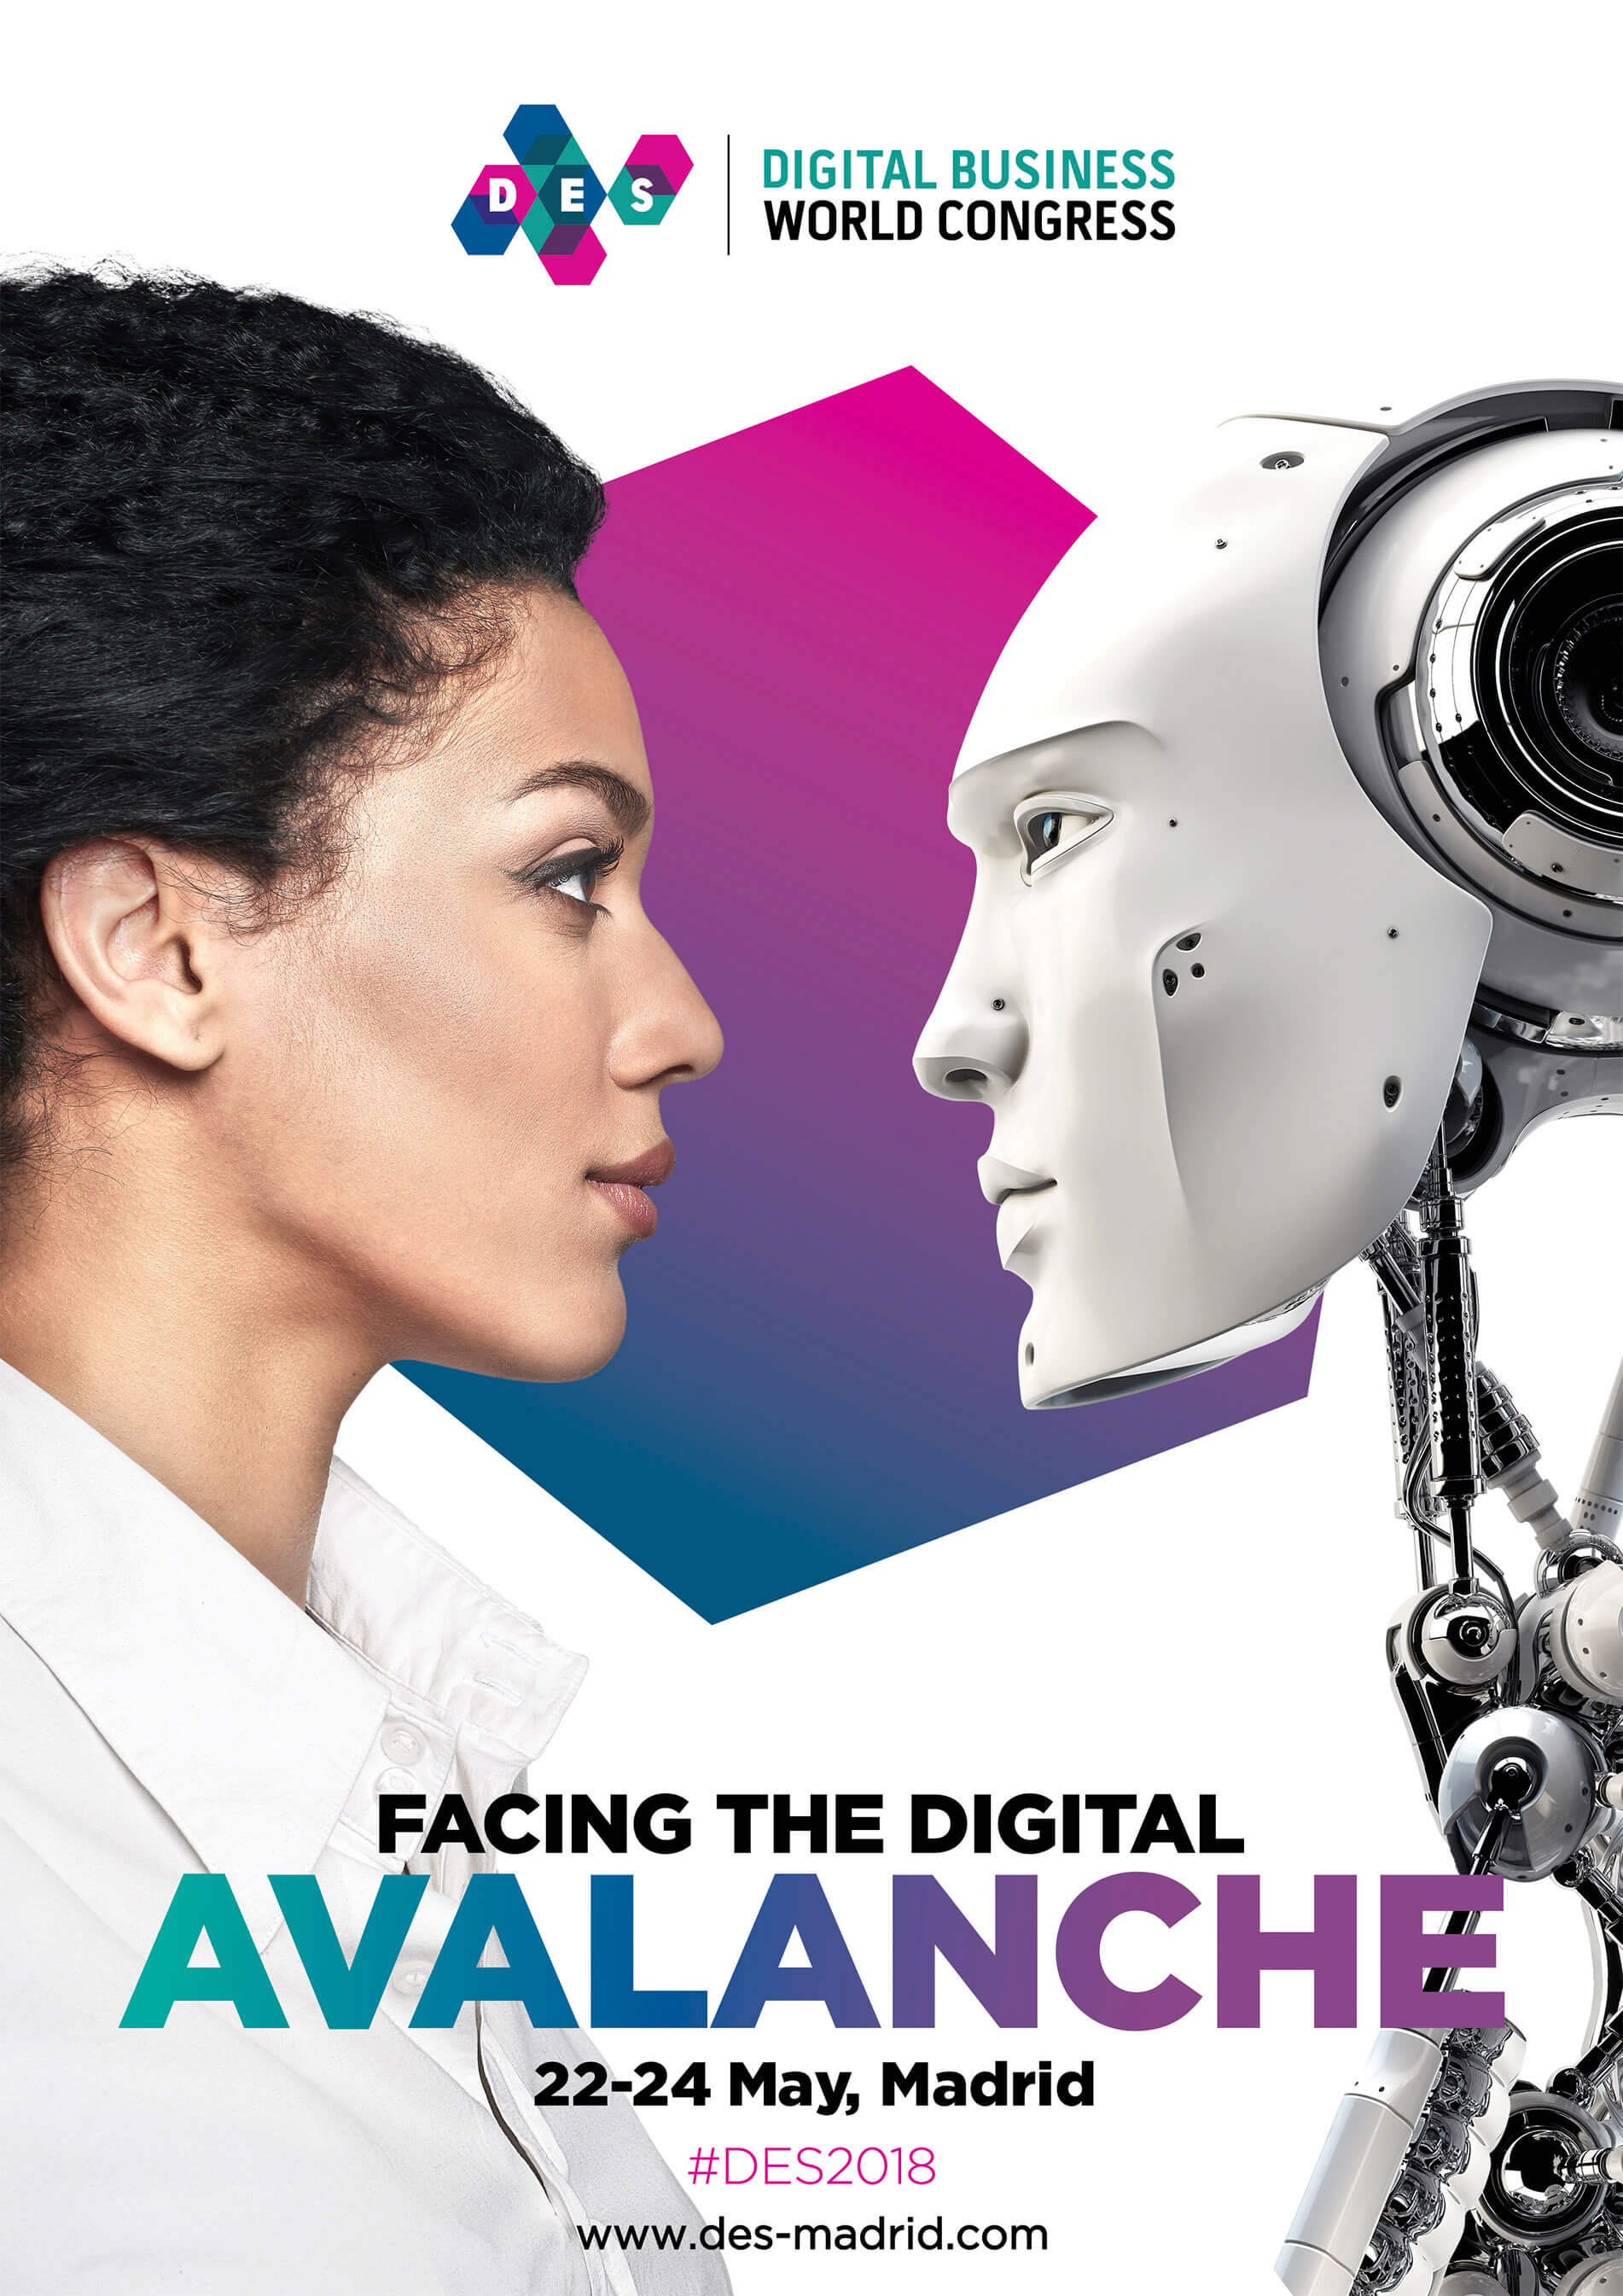 PROUN en el Digital Business World Congress 2018